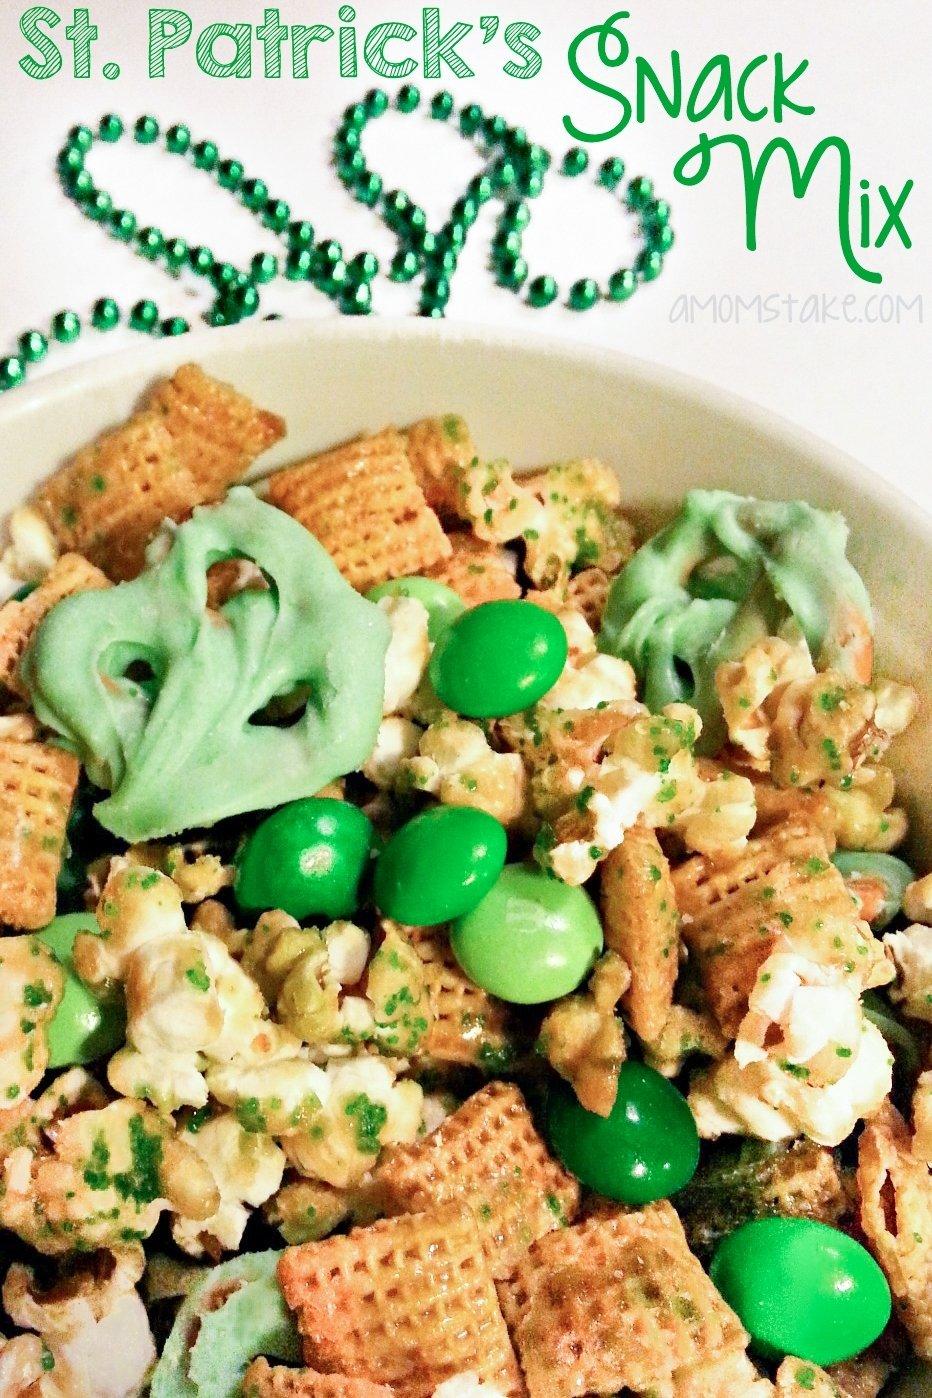 10 Stunning St Patrick Day Food Ideas st patricks day snack mix a moms take 3 2020